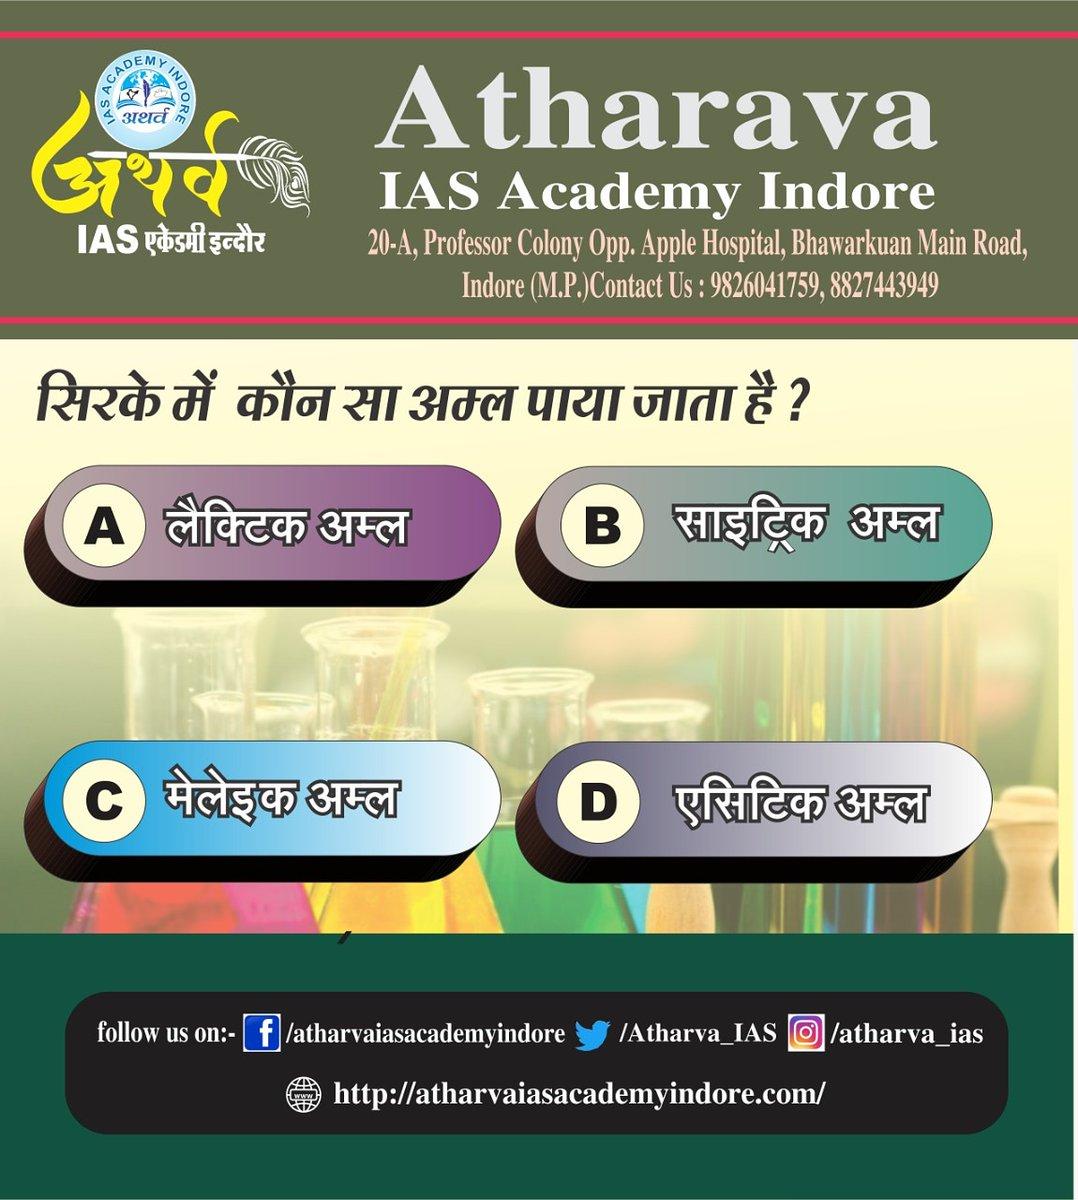 #AtharvaIASAcademyIndore #Indore #MadhyaPradesh #India Website :- http://atharvaiasacademyindore.com/ Contact Us :- 9826041759 Bhawarkua 20-A, Professor Colony, Opposite Apple Hospital,Indore #MP #UPSC #MPPSC #IAS #IPS #NDA #CDS #MPSI #CivilServices #Quiz #Atharva_IAS_Academy_Indorepic.twitter.com/RhuP7vDdin